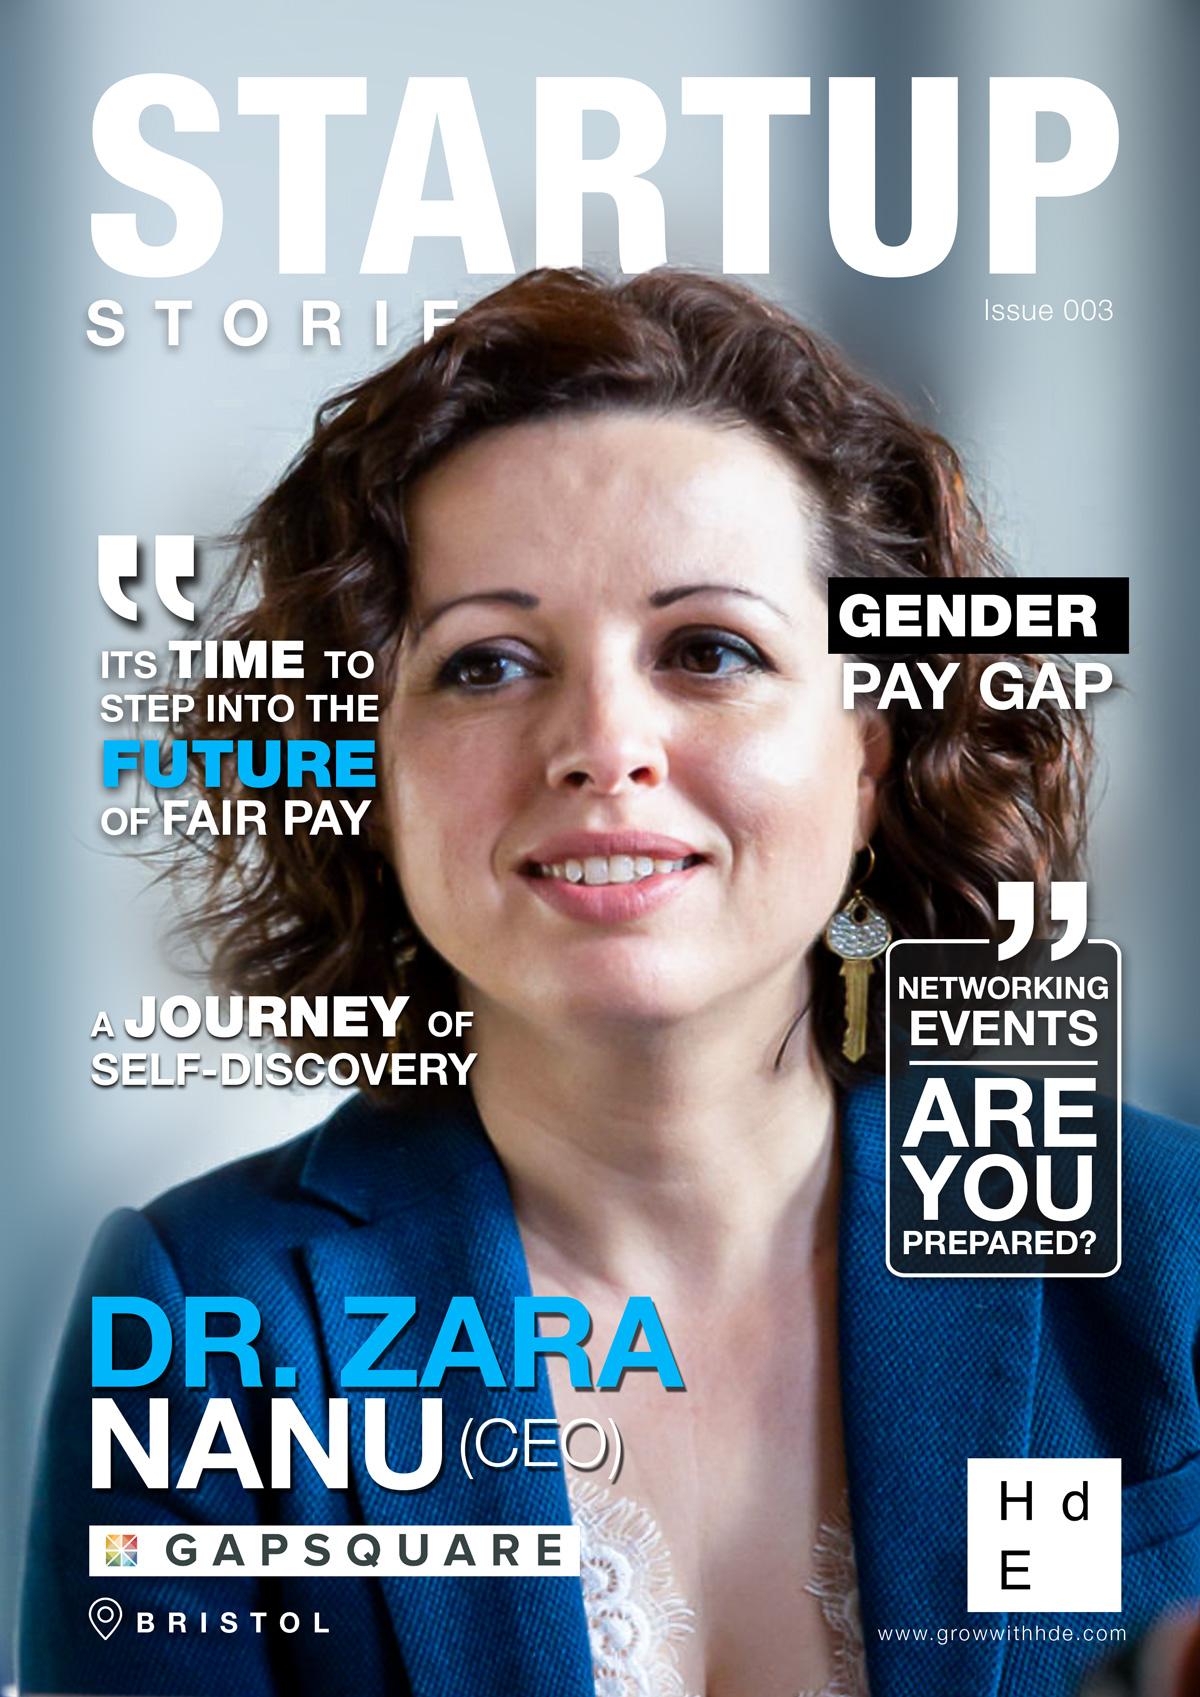 HdE-Interview-with-Dr-Zara-Nanu---Gapsquare-Bristol